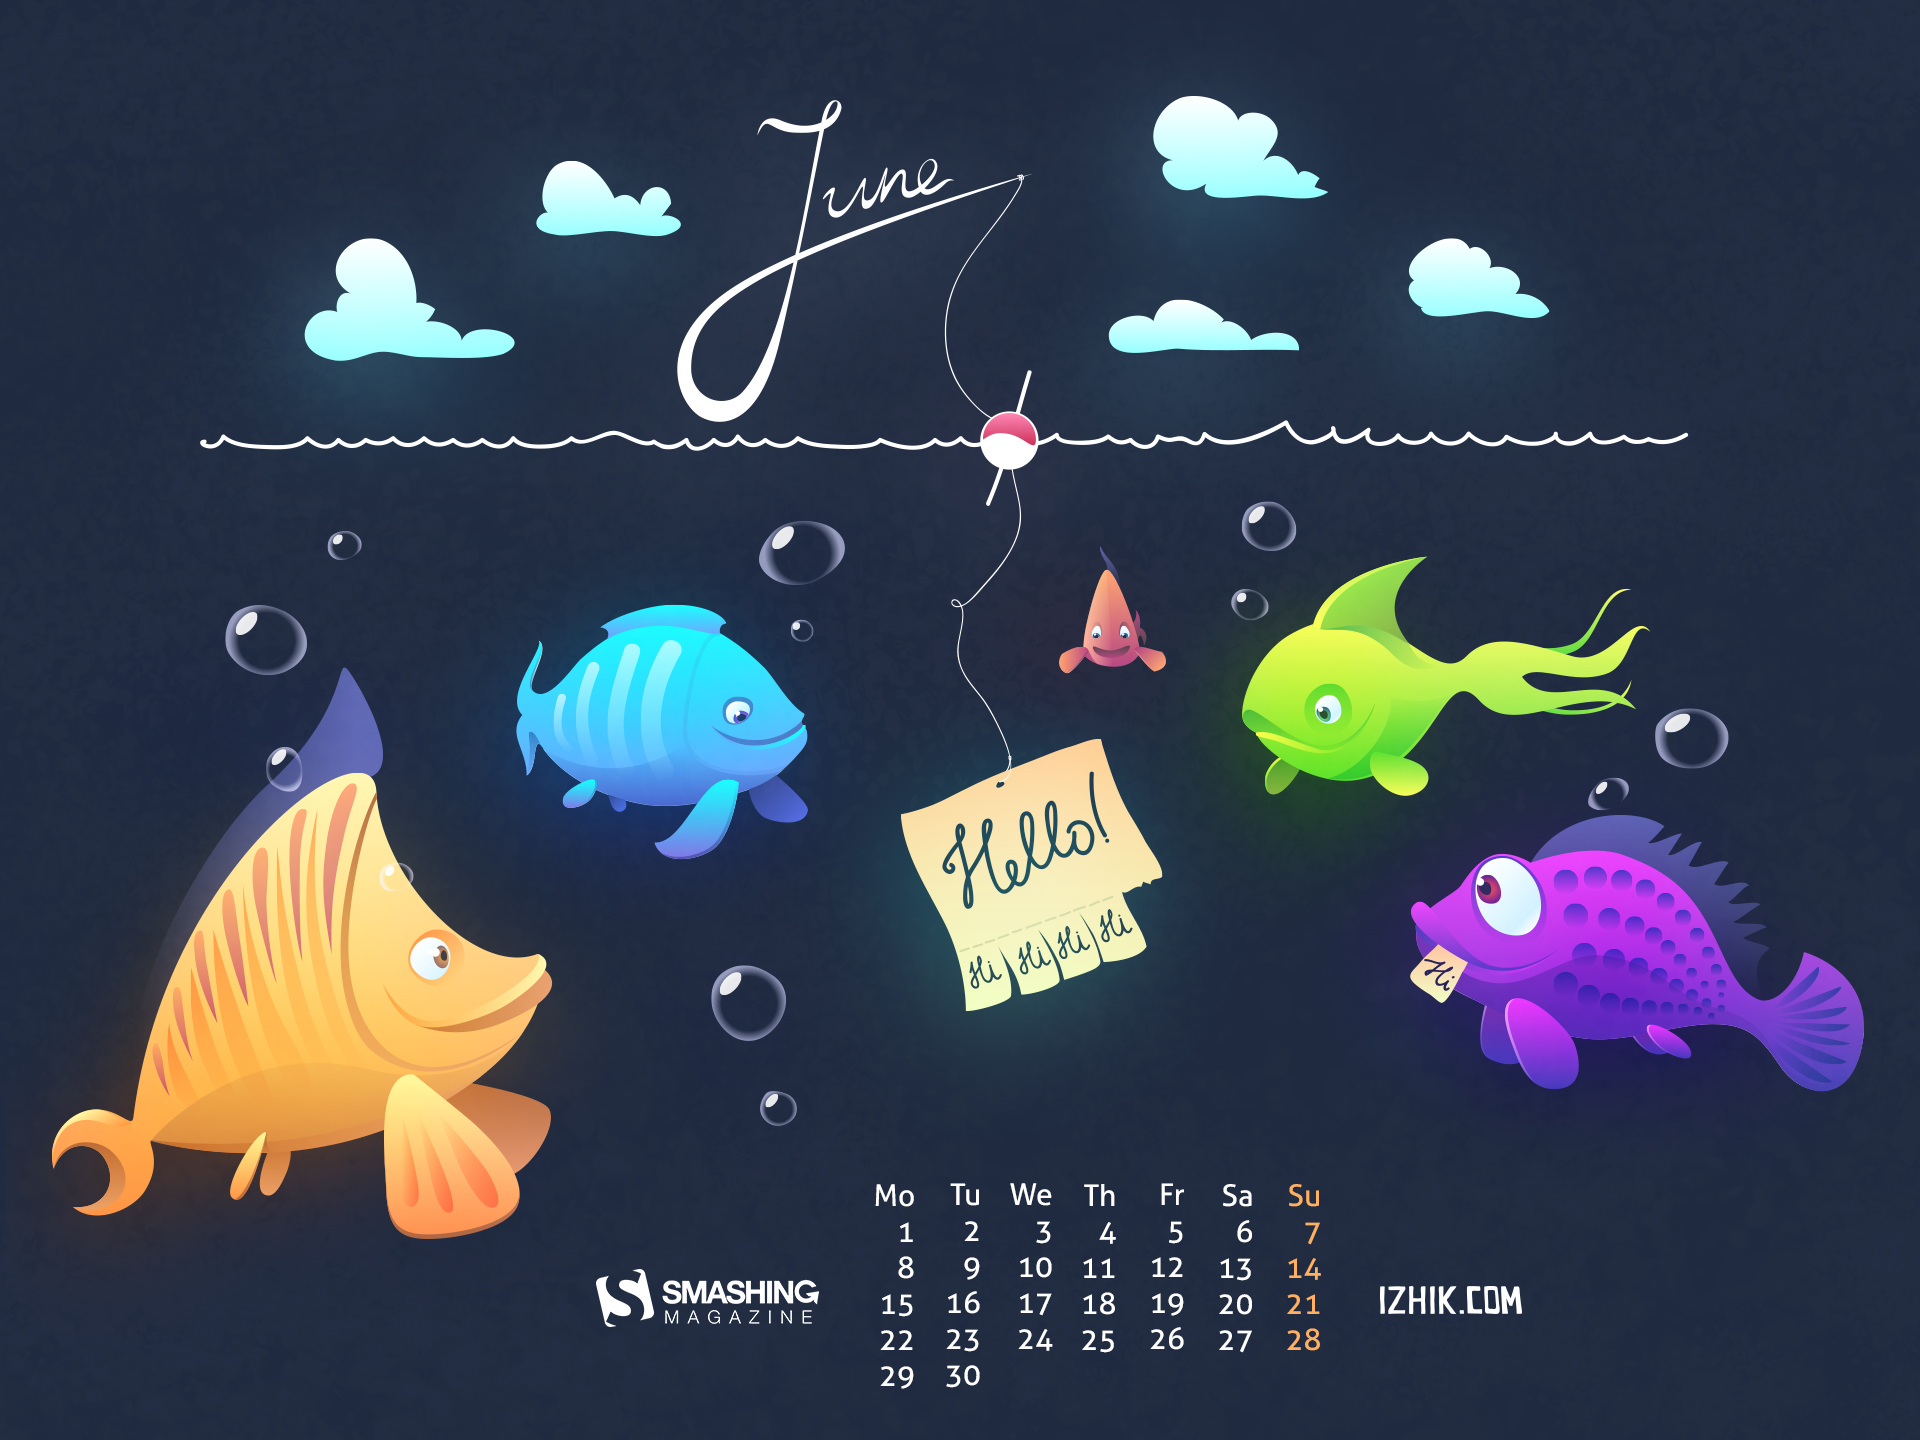 Desktop Wallpaper Calendars June 2015 Smashing Magazine 1920x1440